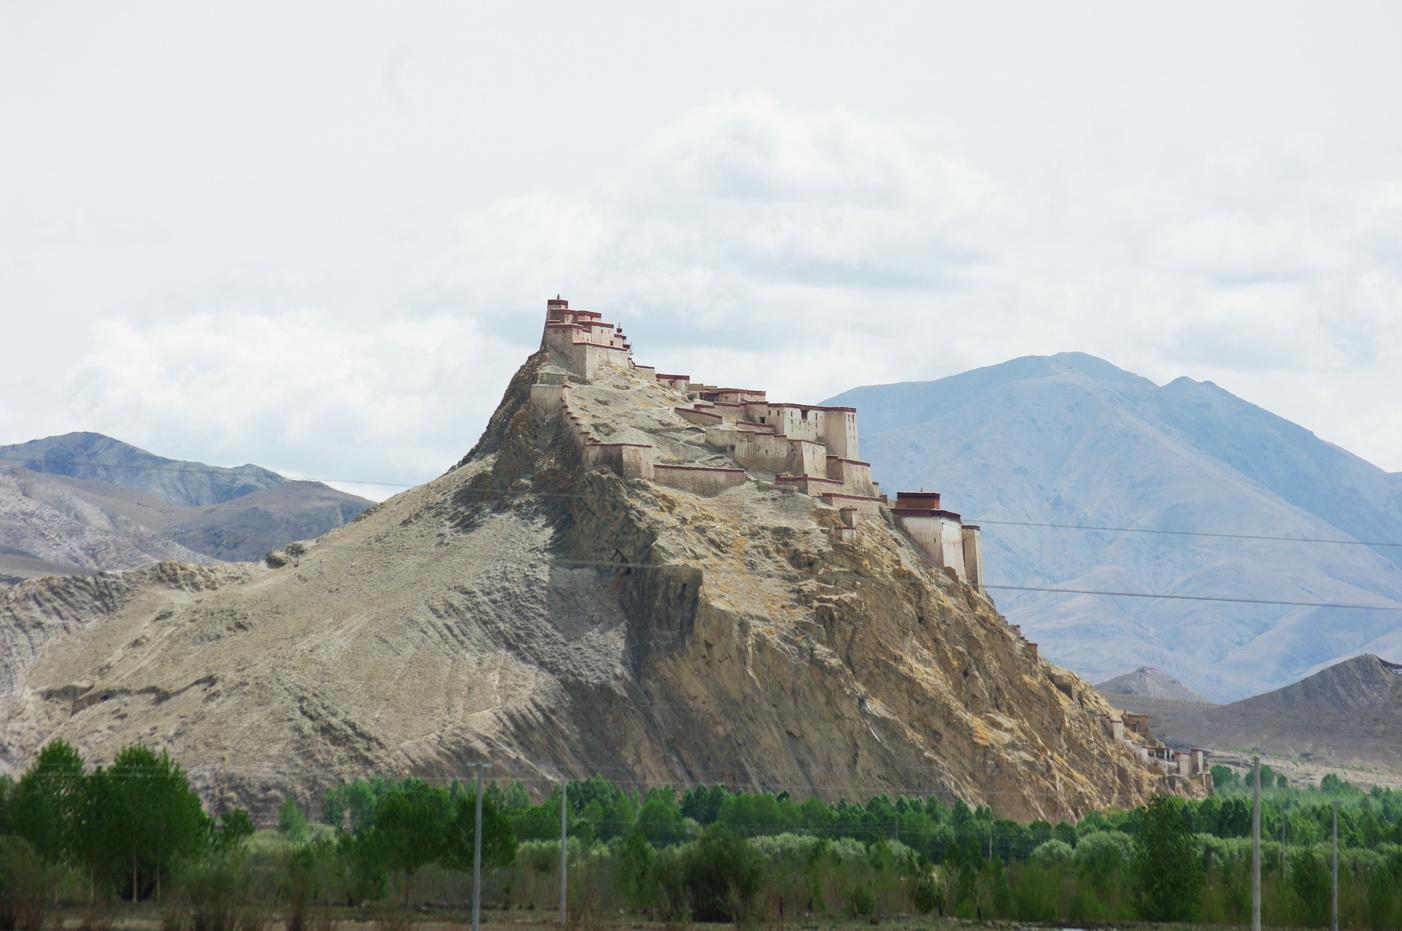 TIB-gyantse-dzong-nyangchu.jpg